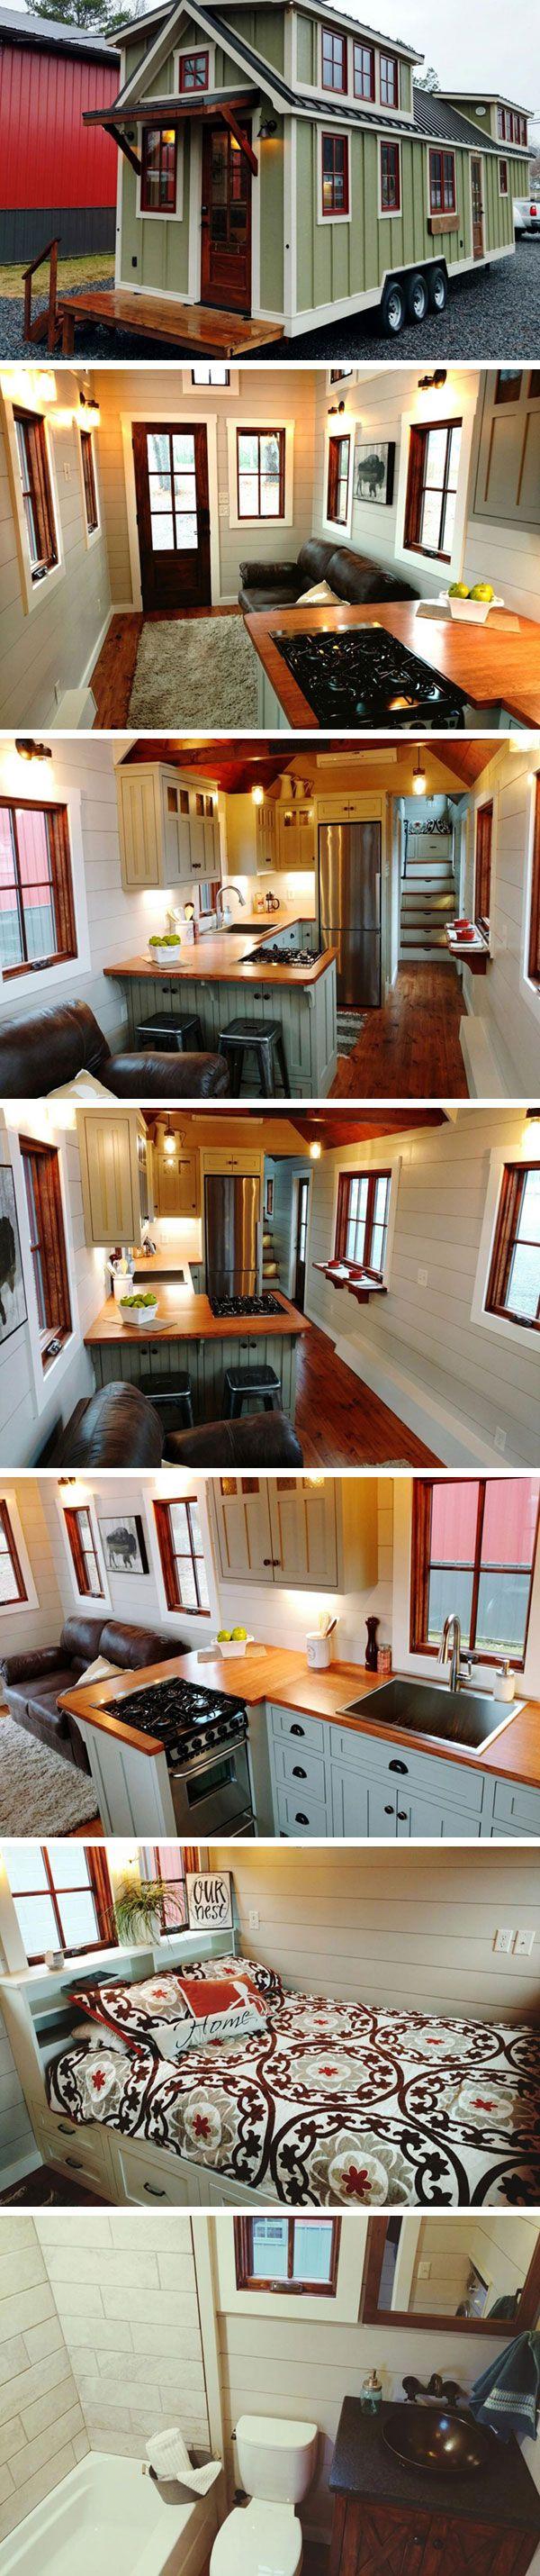 Дом на колесах Luxury Farmhouse от Timbercraft Tiny Homes  #tinyhomesdigest #tinyhouse #countrylife #backyard #houseonwheels #camper #travel